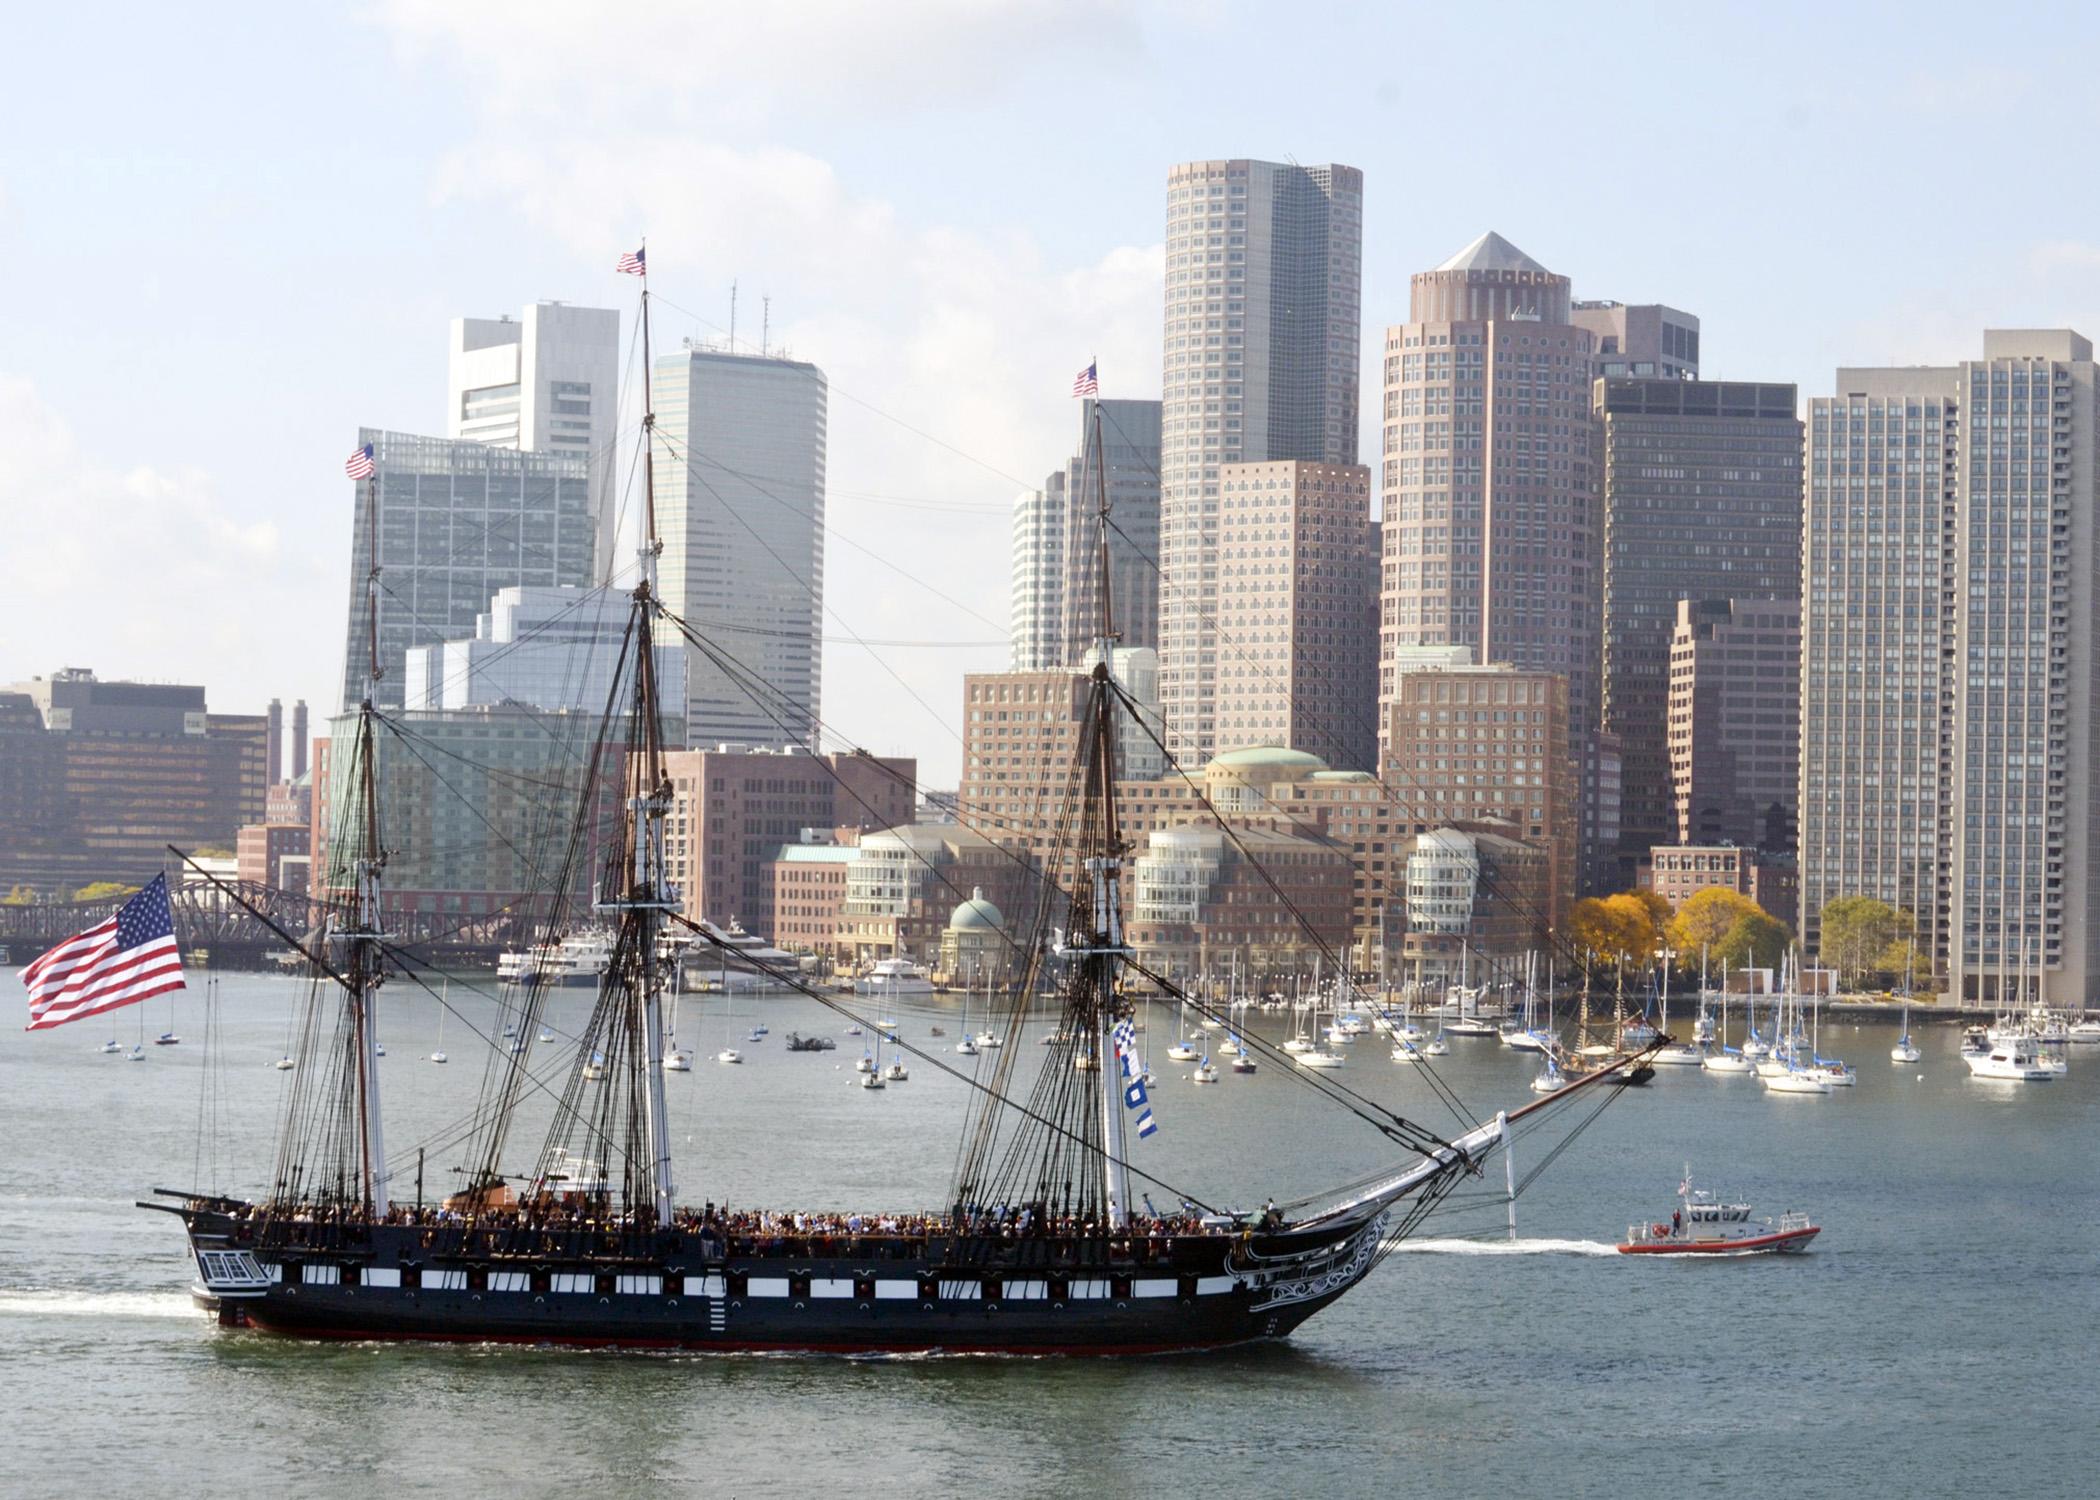 USS Constitution celebrates 217th birthday